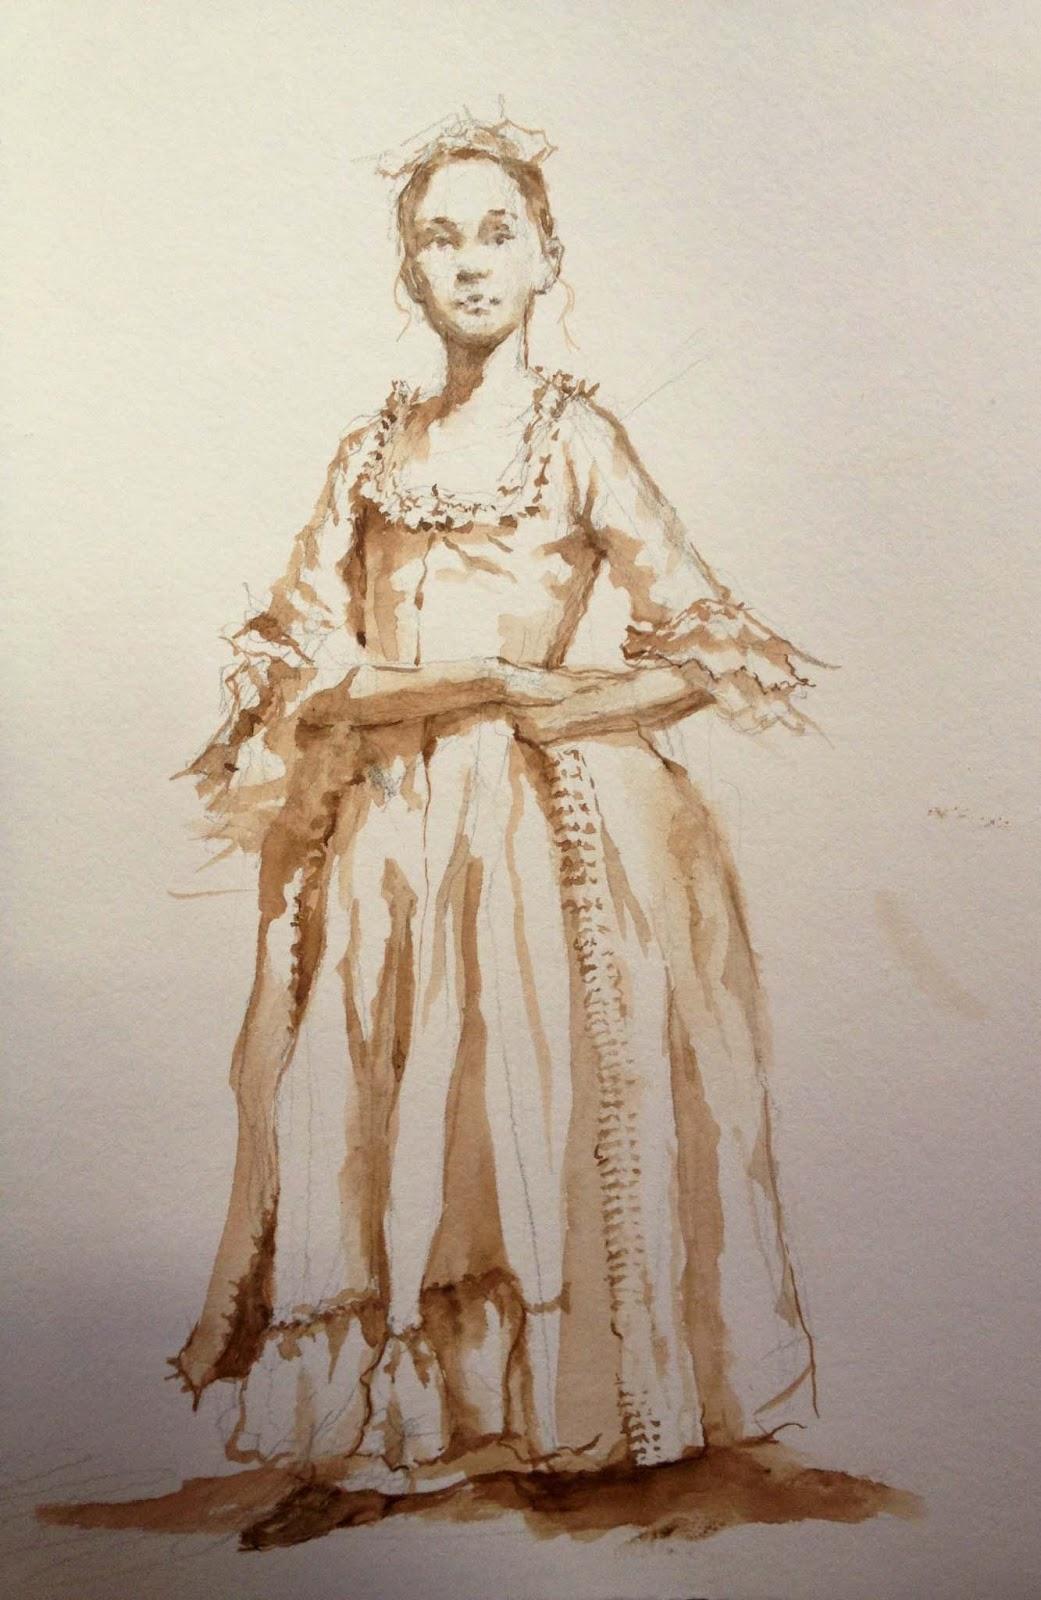 Marie Dauenheimer S Art And Anatomy Blog Watercolor Wash